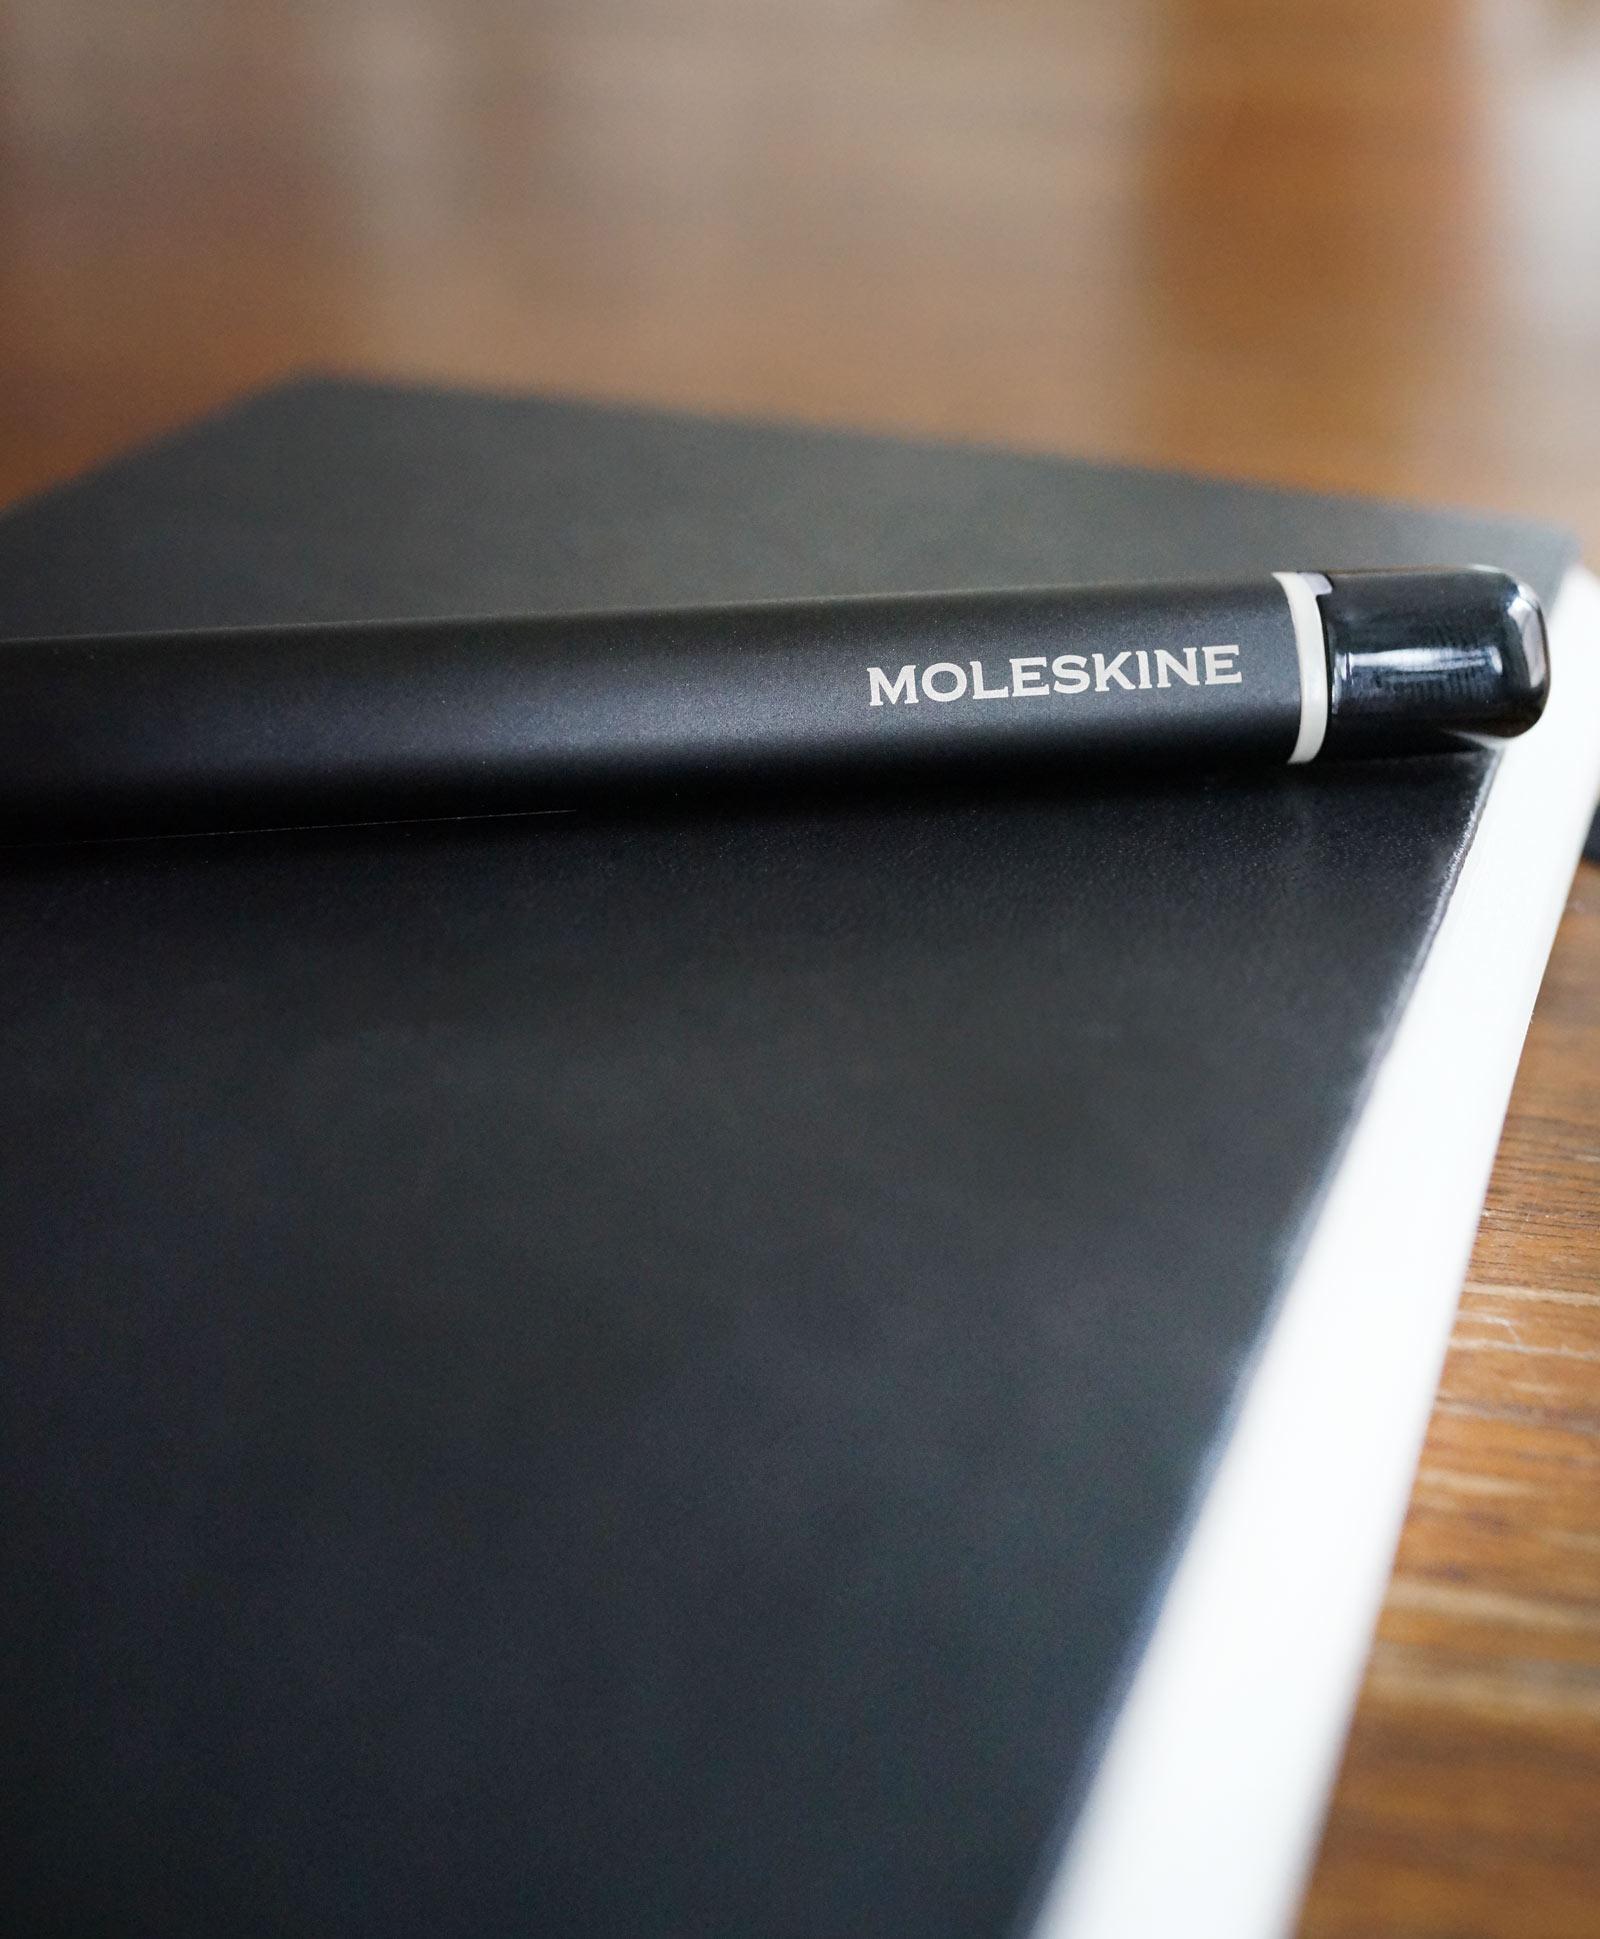 moleskine_smart_writing_set-4